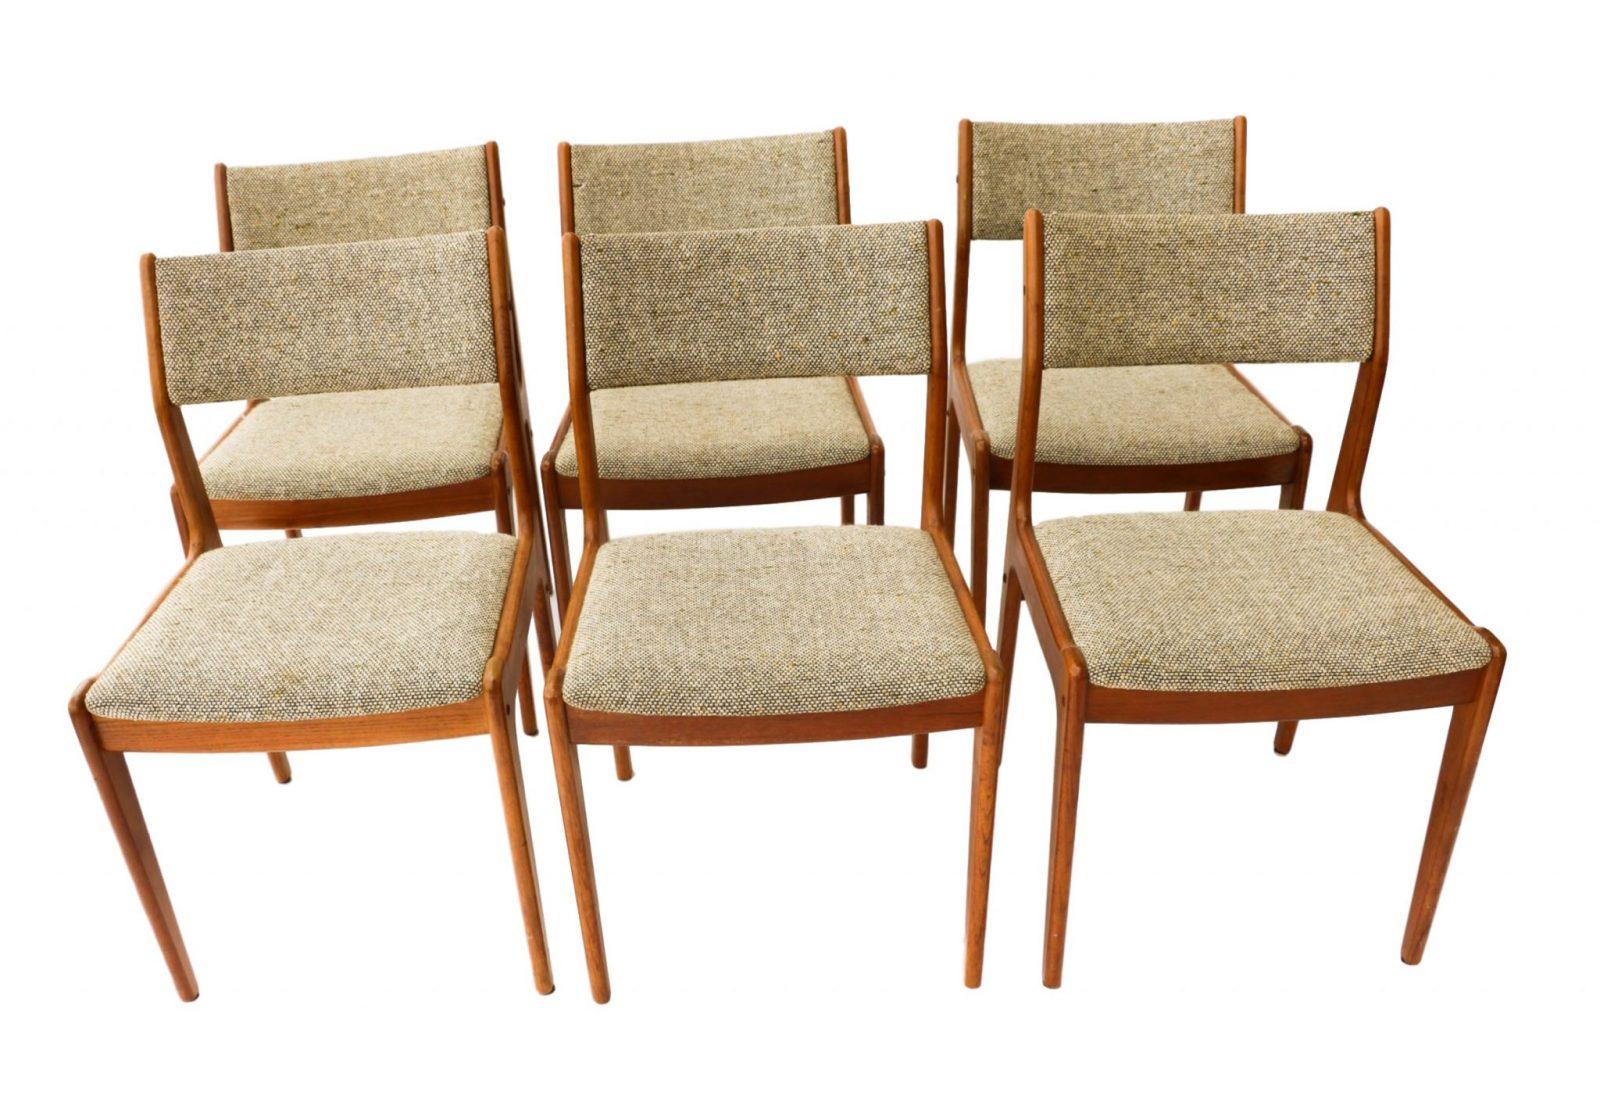 Gorgeous teak scandinavia danish modern dining chairs six for Danish modern dining chairs